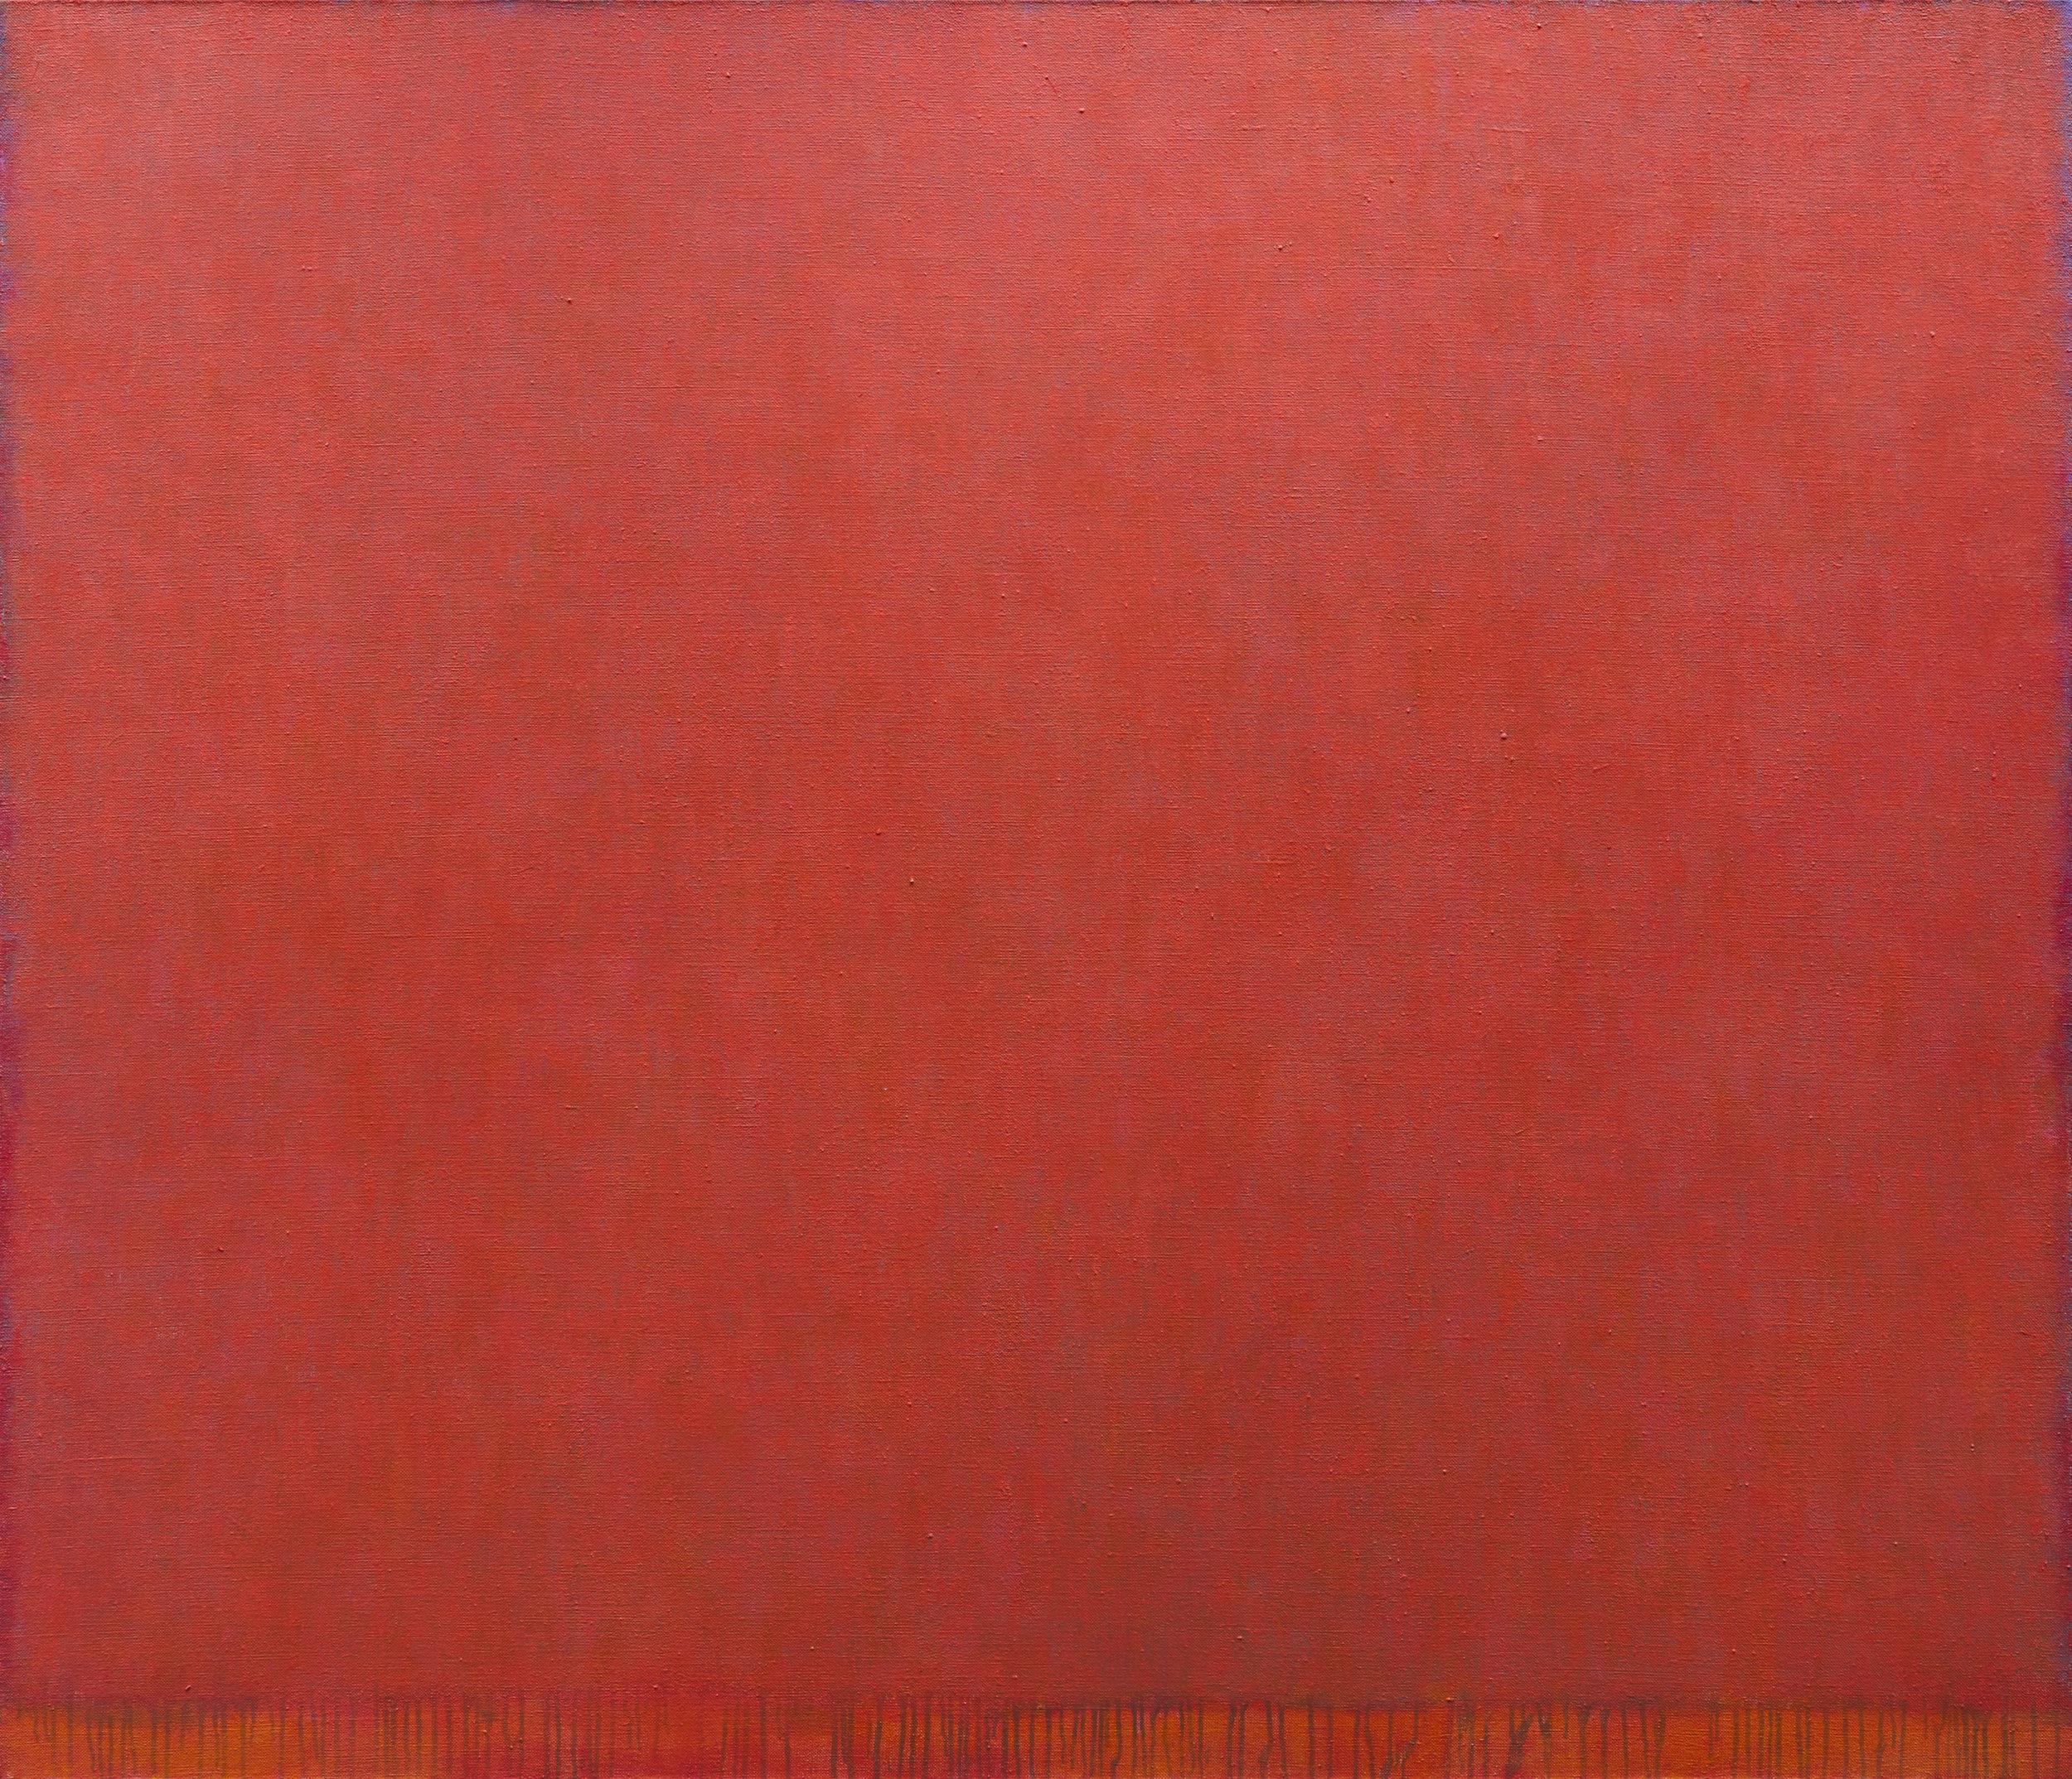 Impermanence Painting IV for Frida 213 x 183 cms